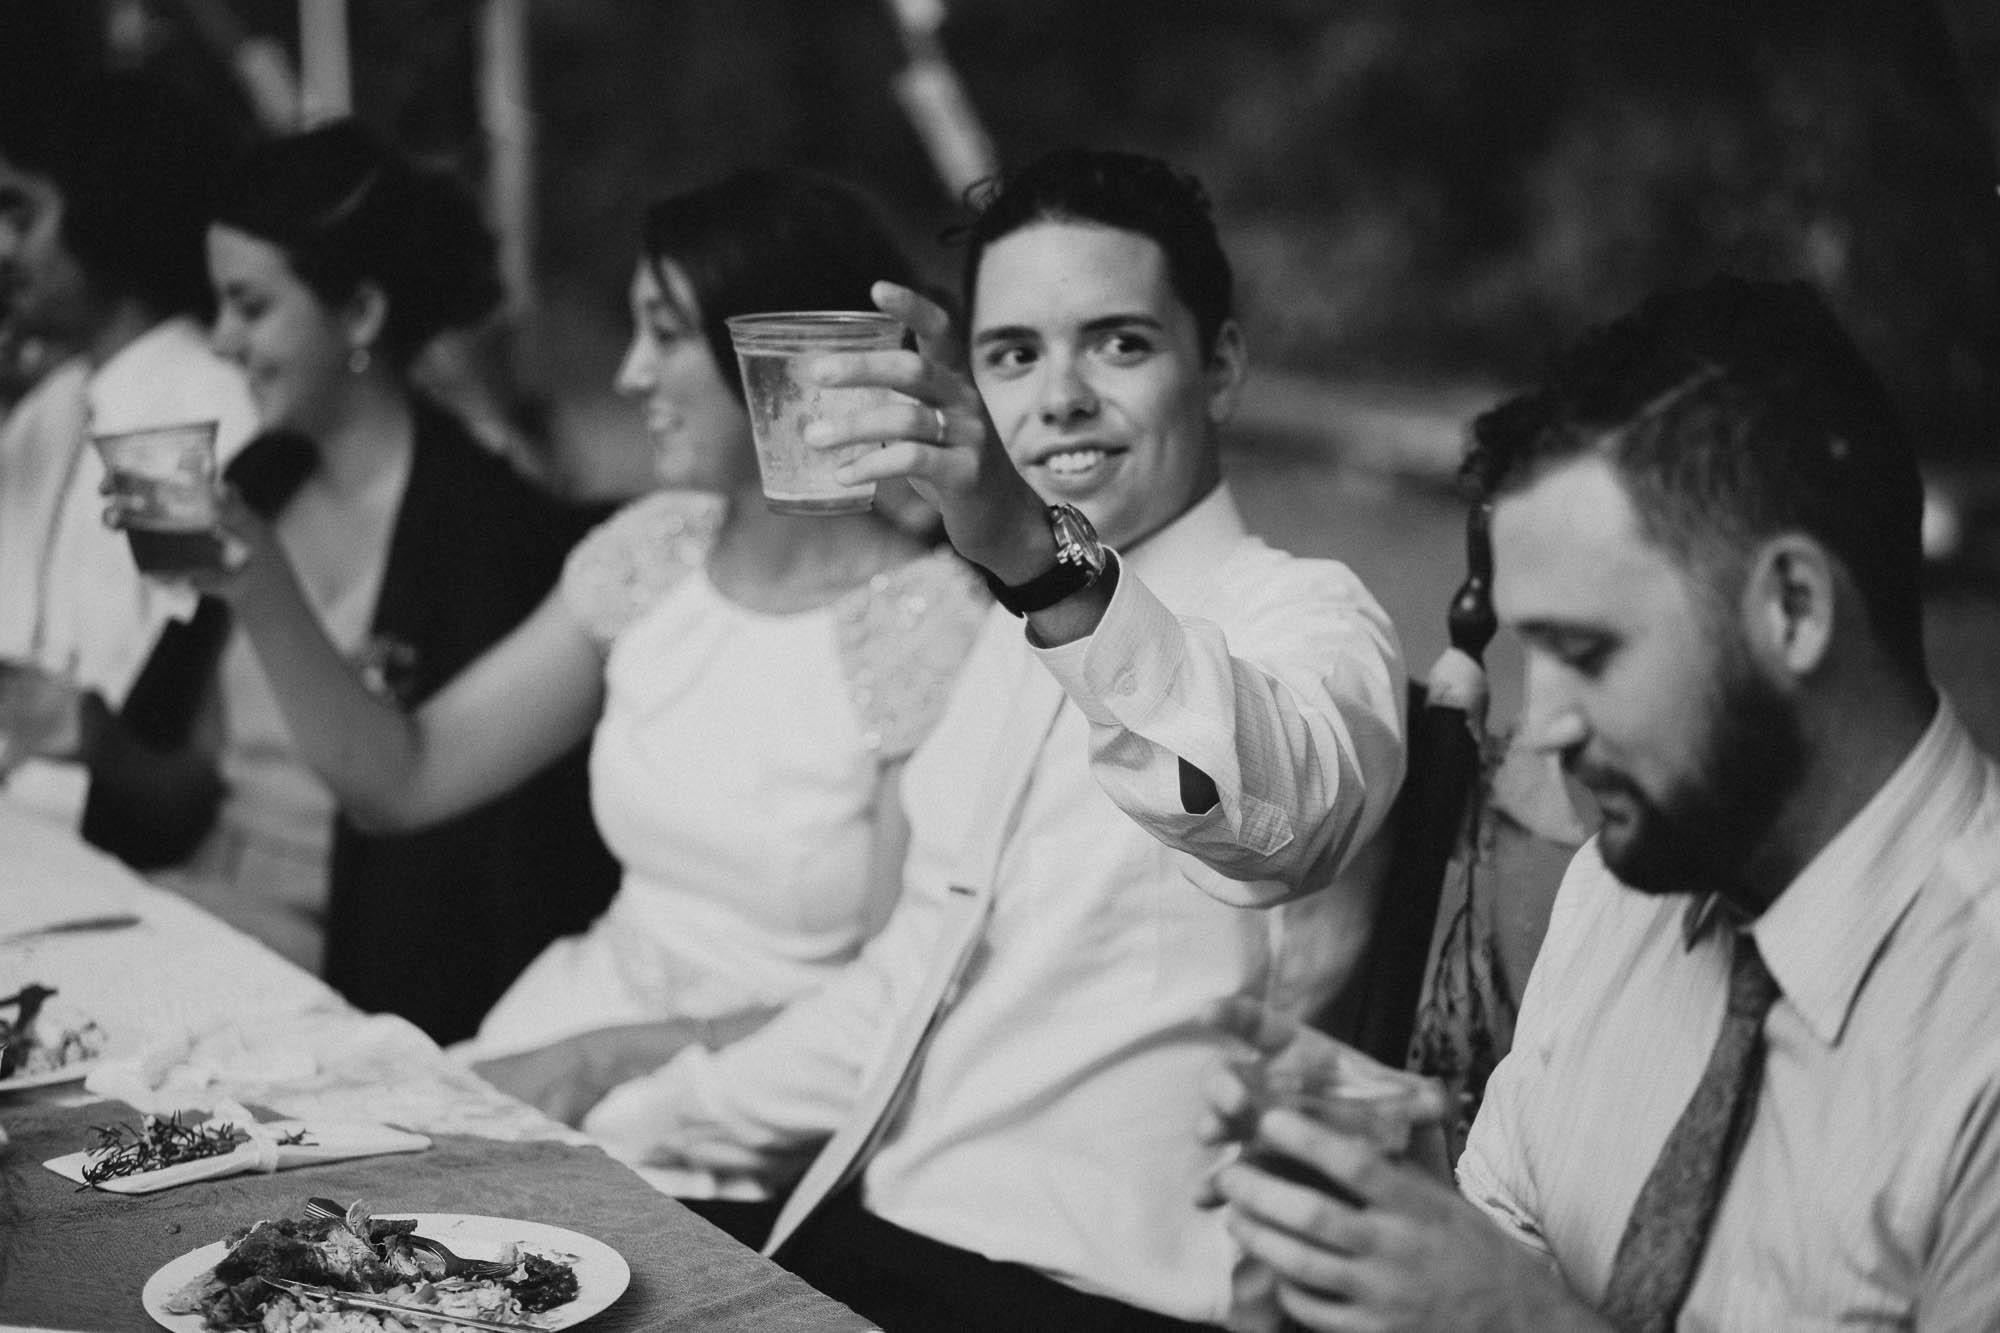 Leah-Graham-Michigan-Outdoor-DIY-Wedding-064@2x.jpg